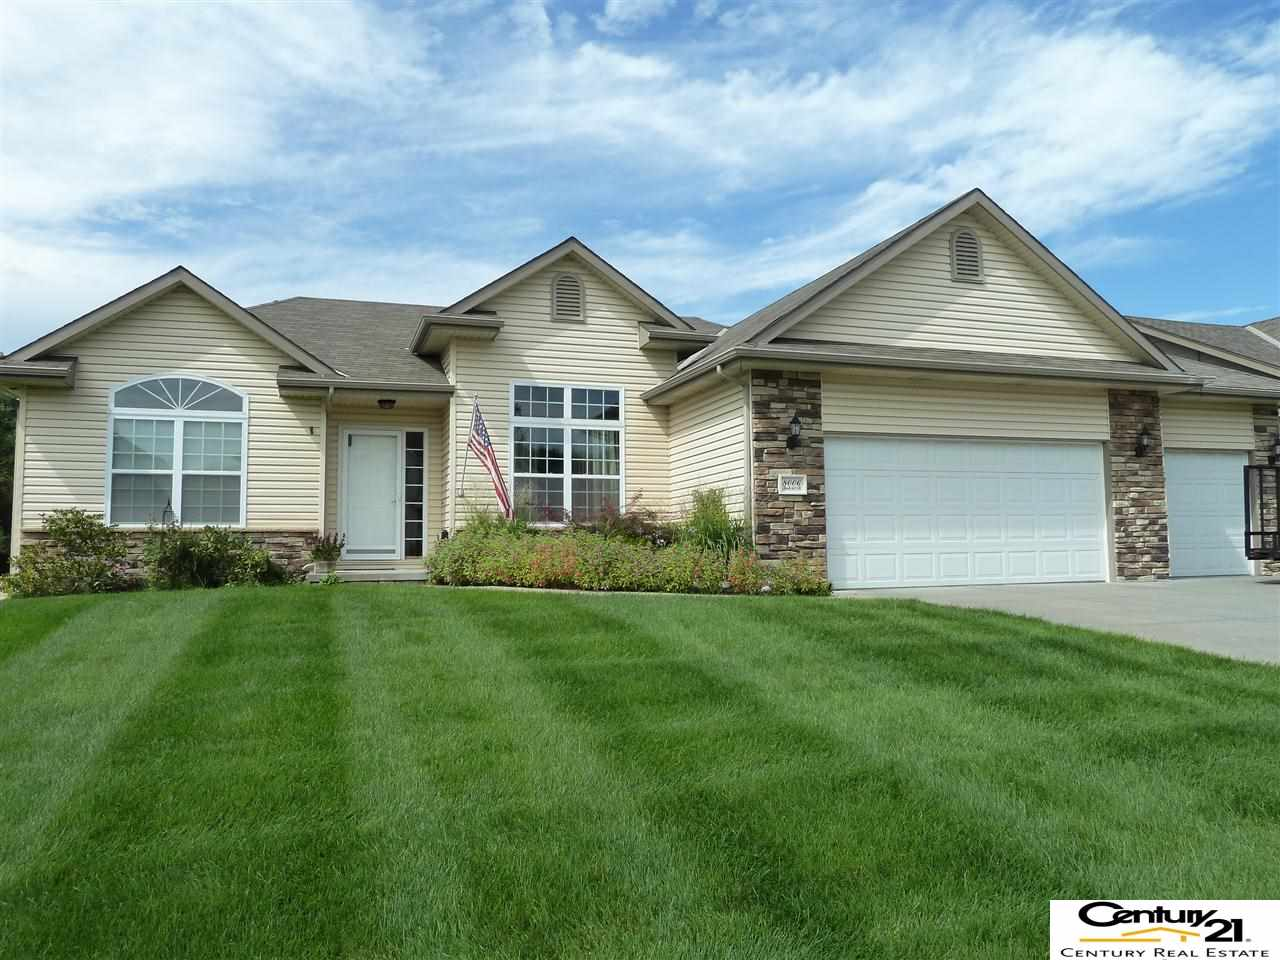 Real Estate for Sale, ListingId: 29384495, La Vista,NE68128